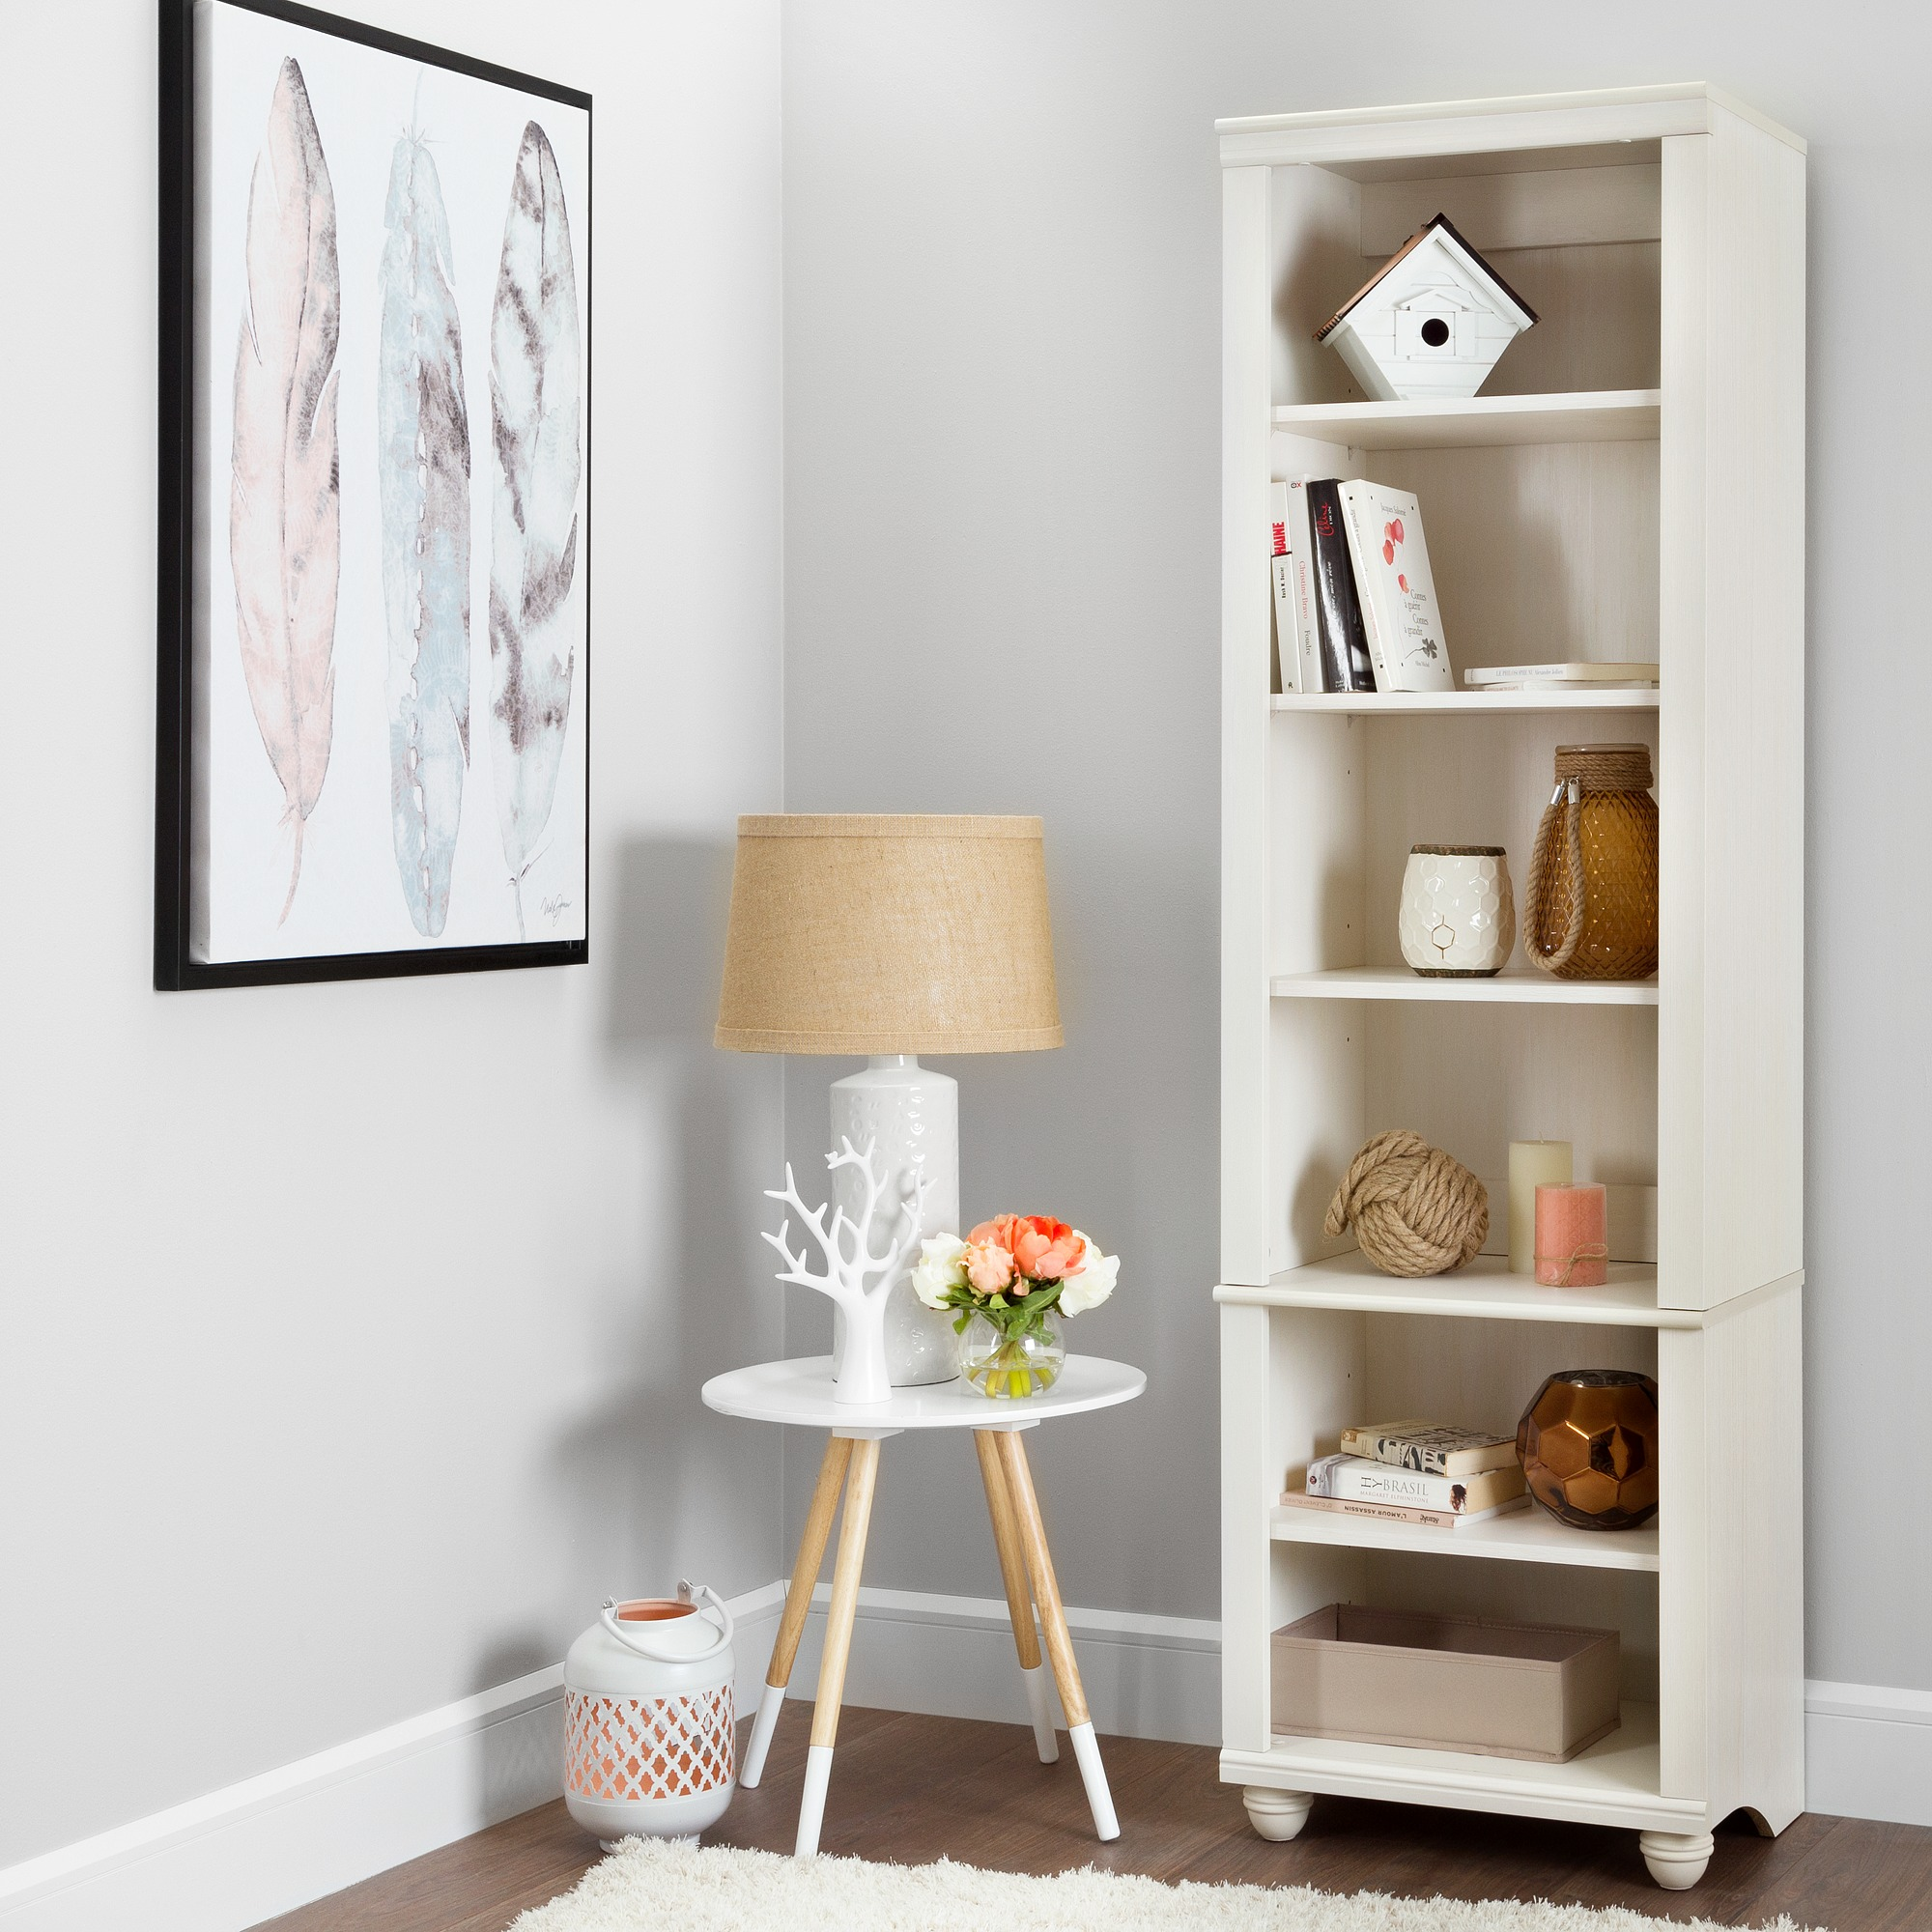 South Shore Hopedale Narrow 6-Shelf Bookcase, Multiple Finishes